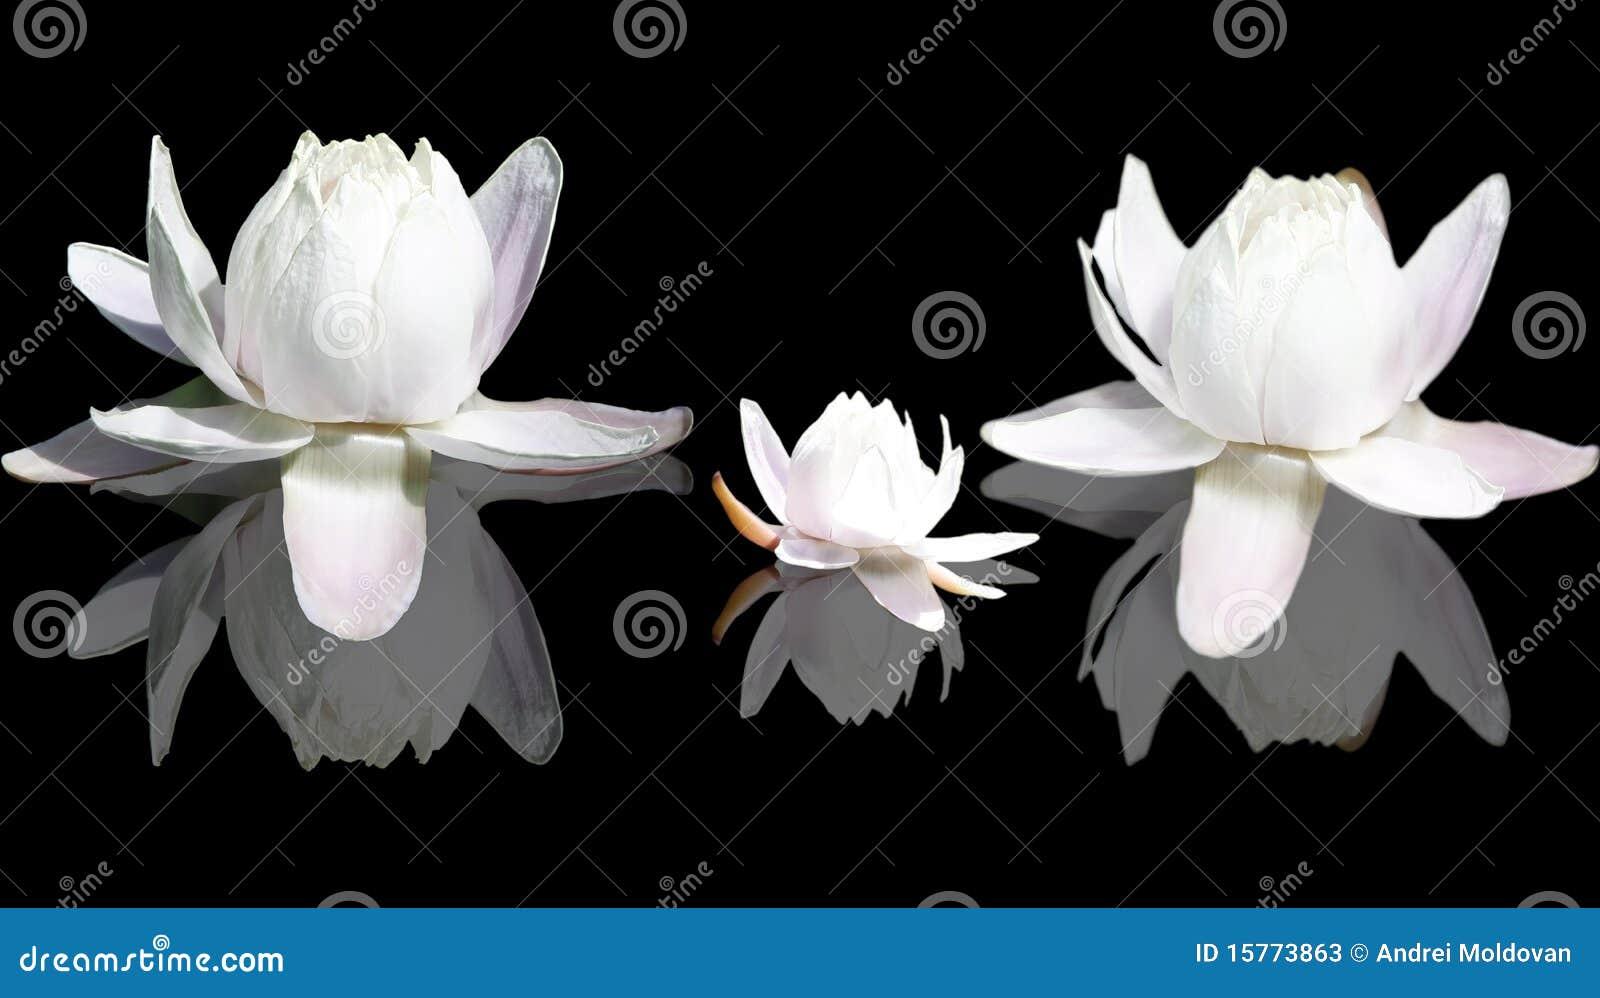 Isolated Lotus flowers